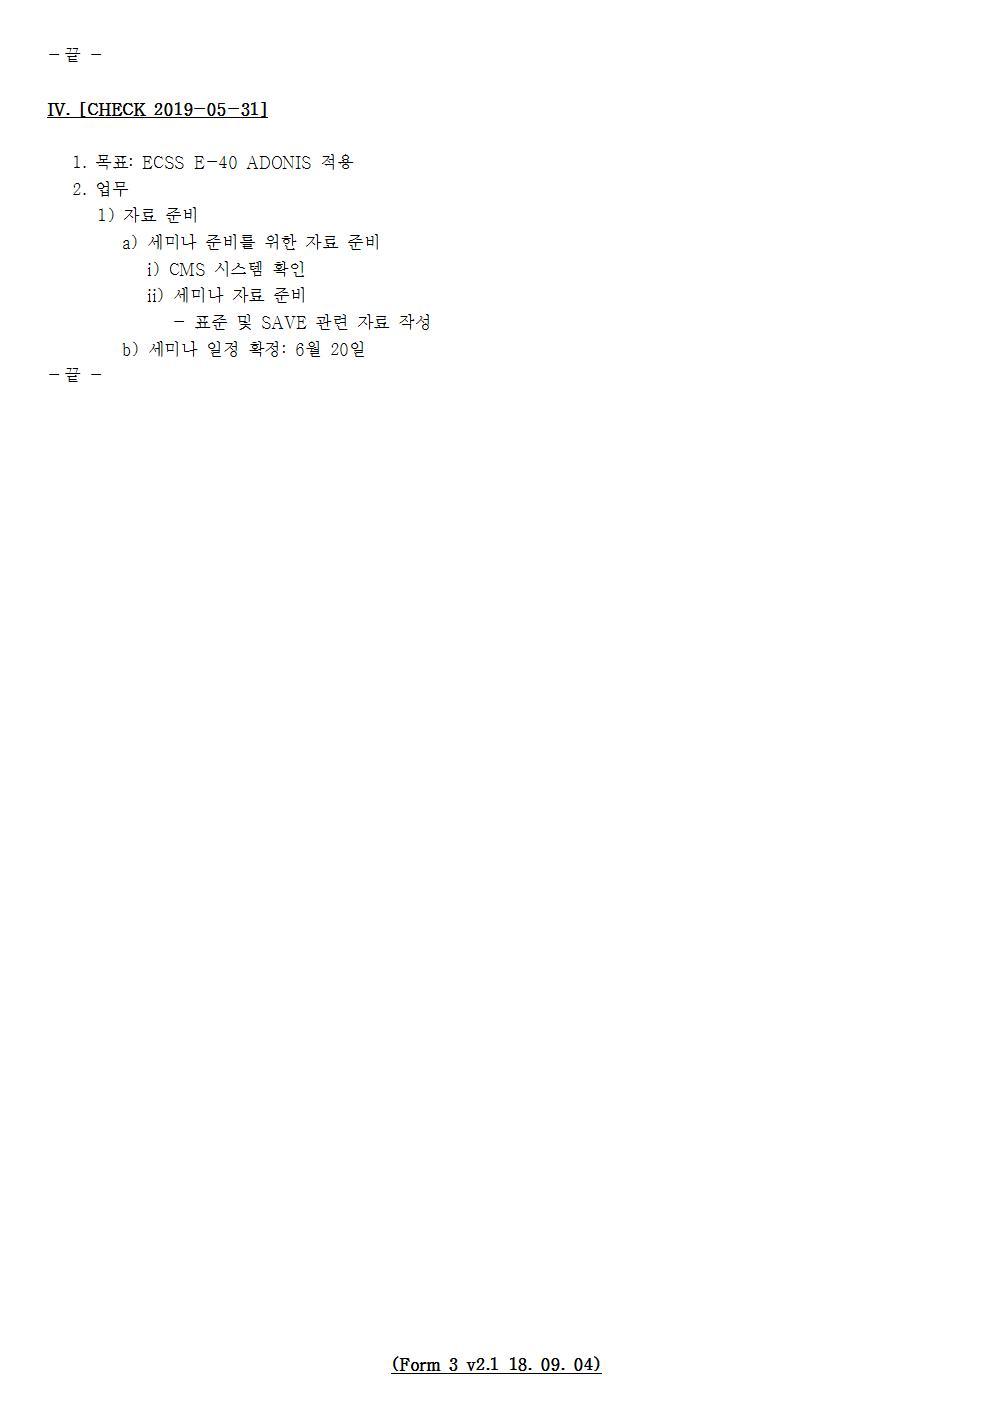 D-[19-004-RD-04]-[CMS]-[2019-05-31][YB]-[19-5-5]-[P+D+C]002.jpg